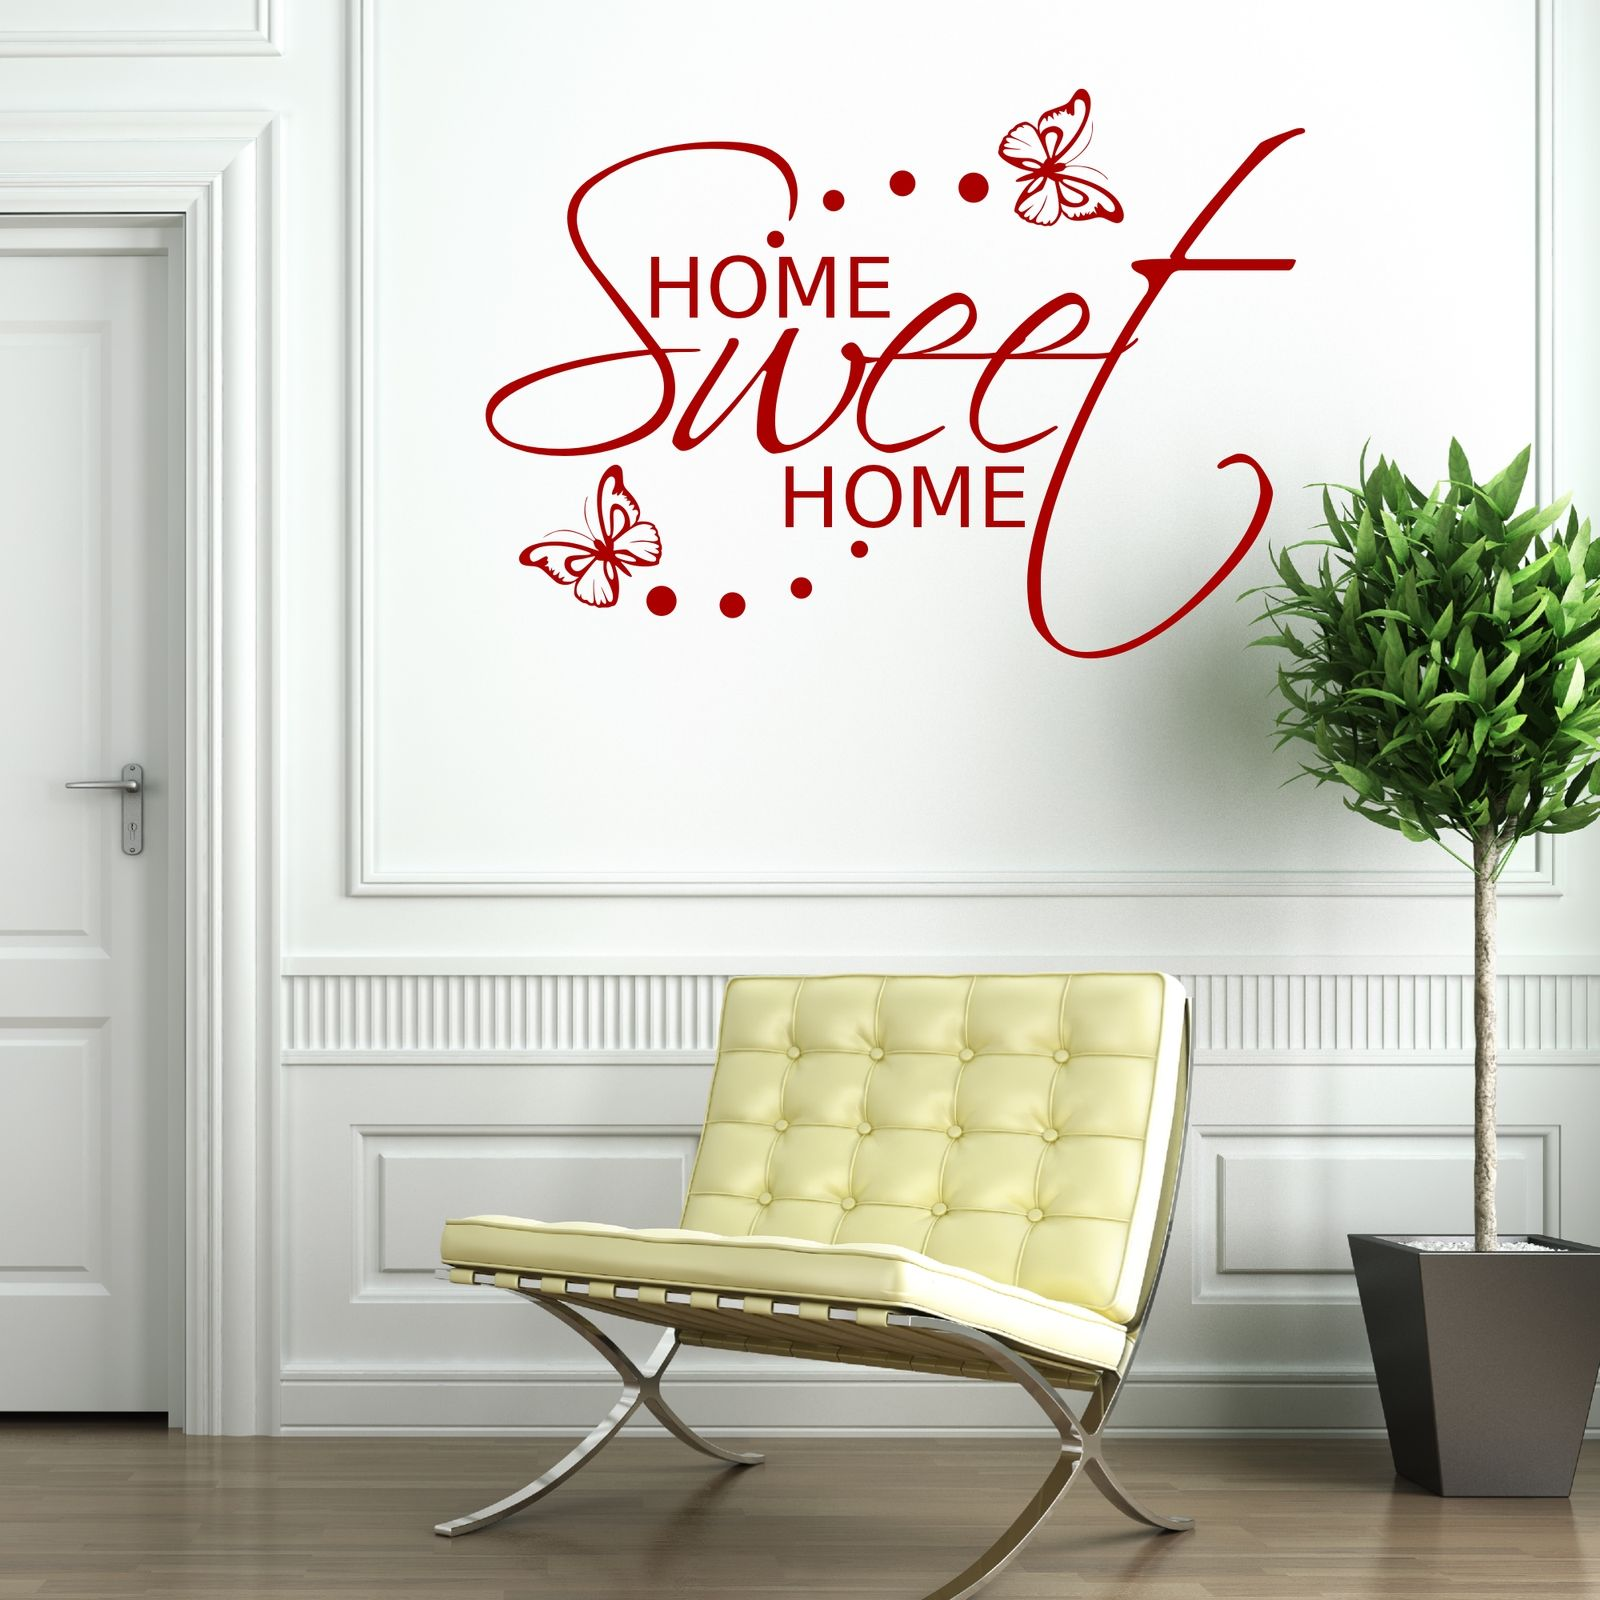 home sweet home wall sticker art room gift decal mural transfer sticker wsd493 ebay. Black Bedroom Furniture Sets. Home Design Ideas